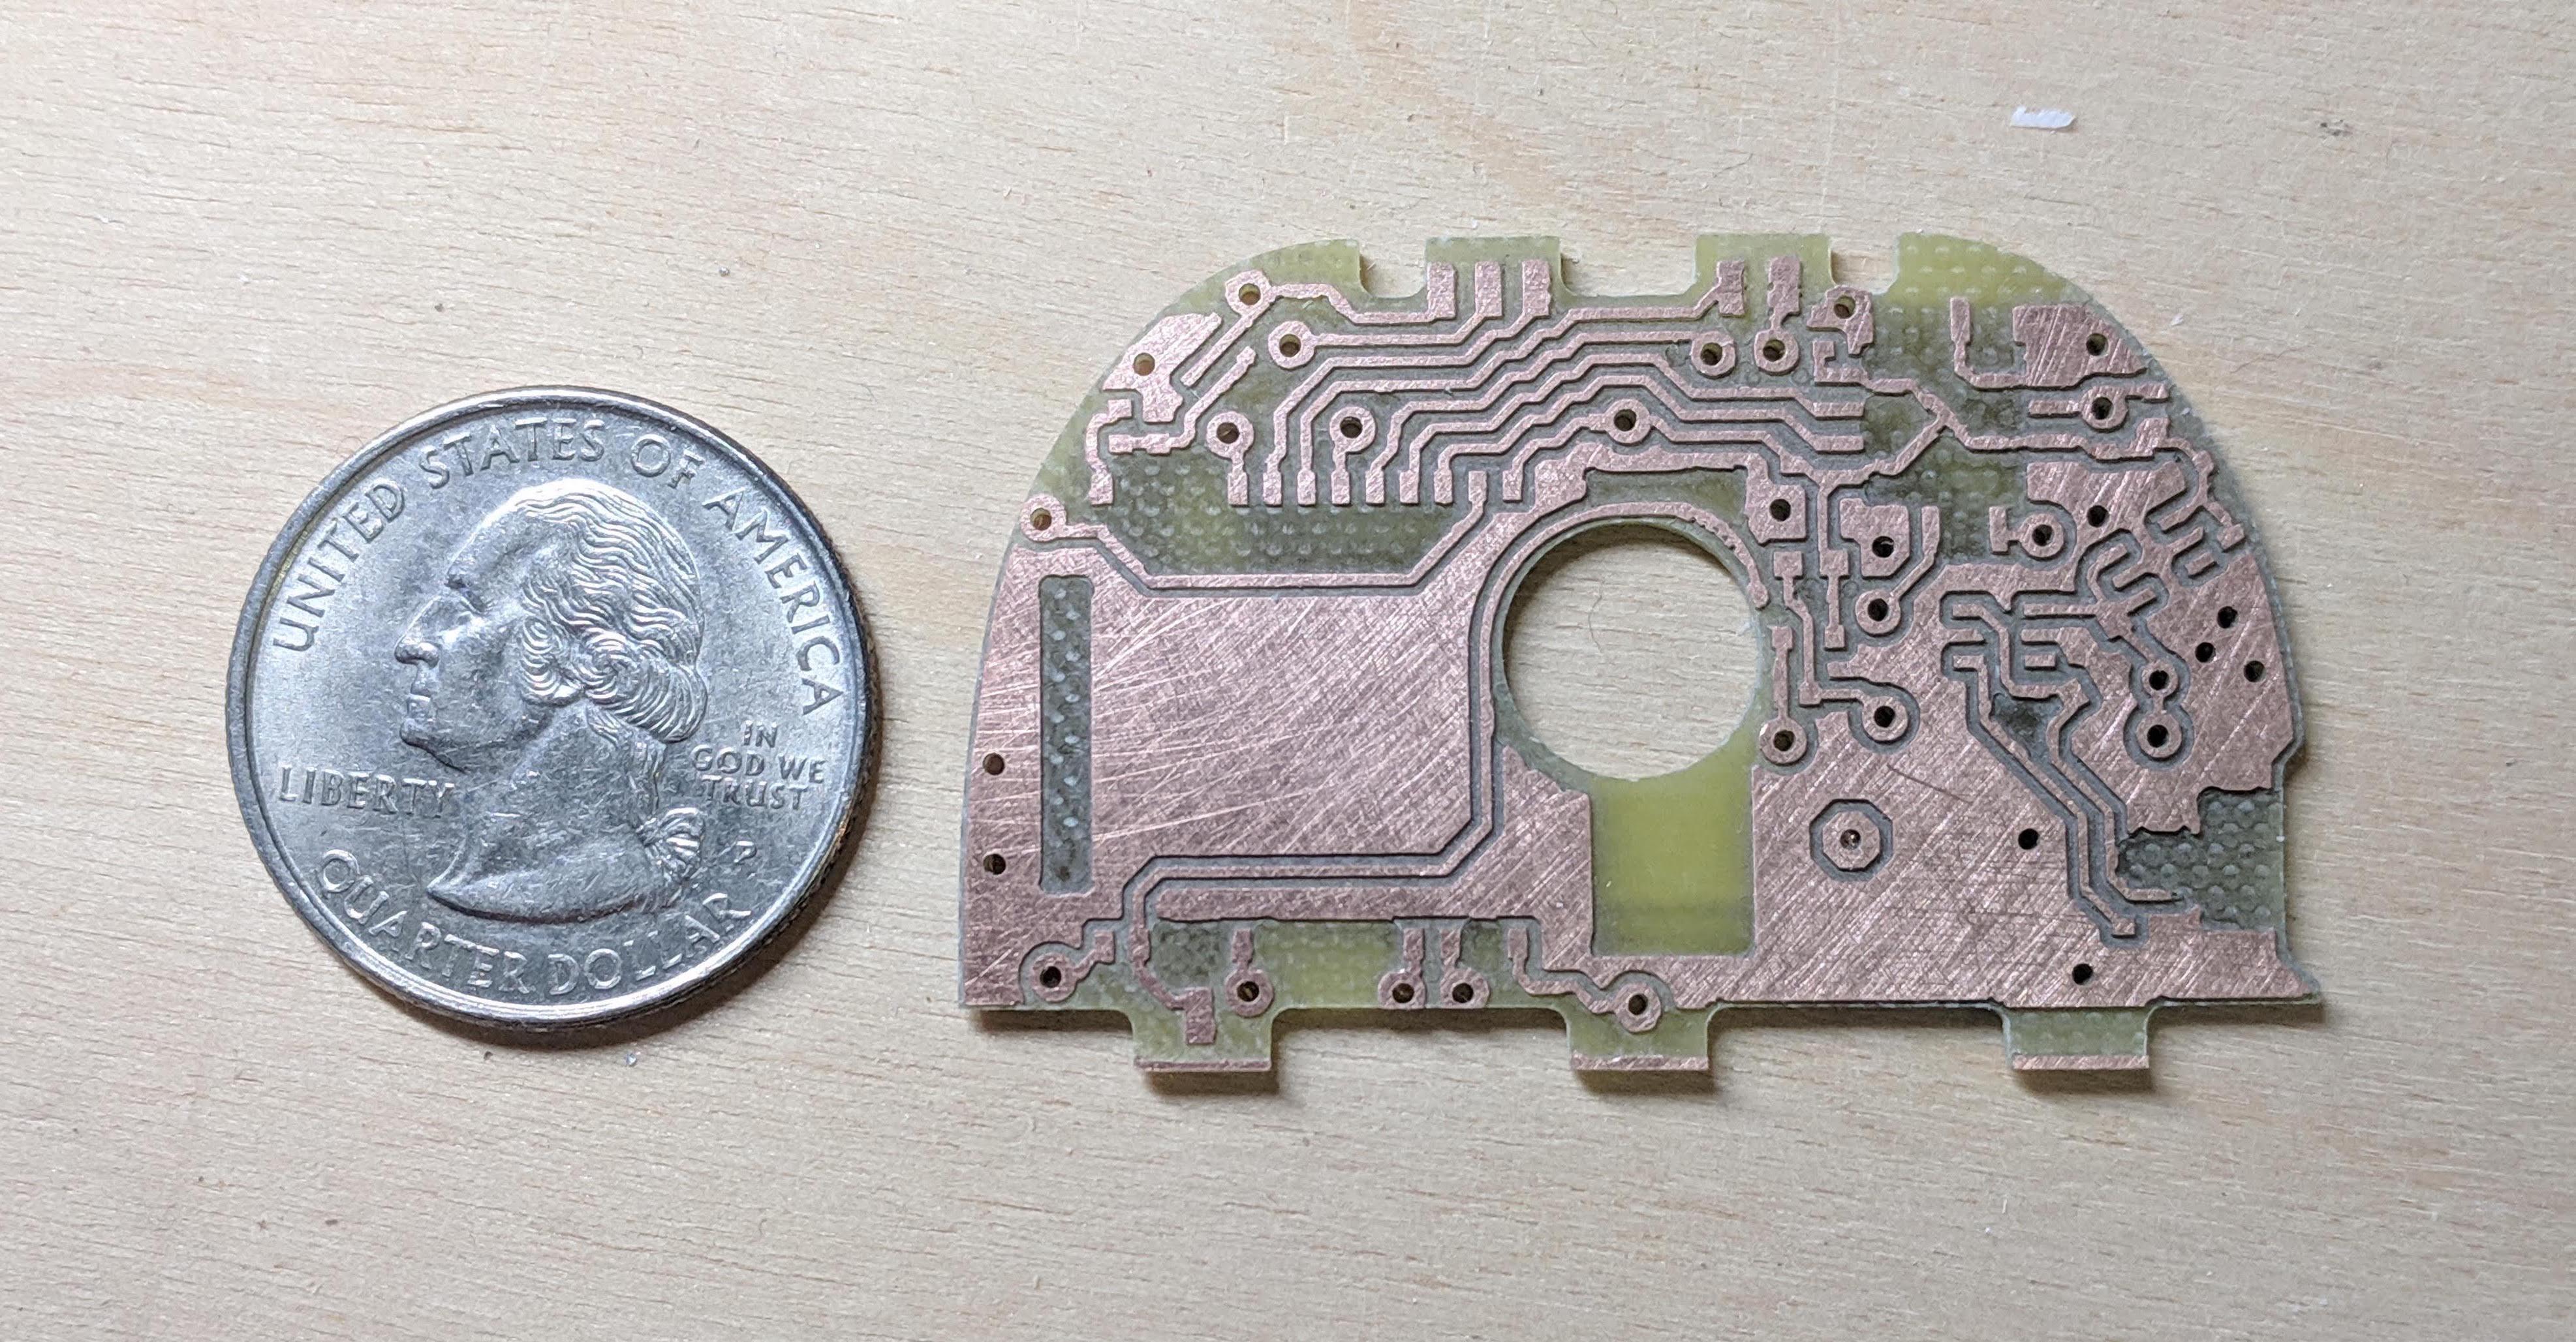 The main PCB